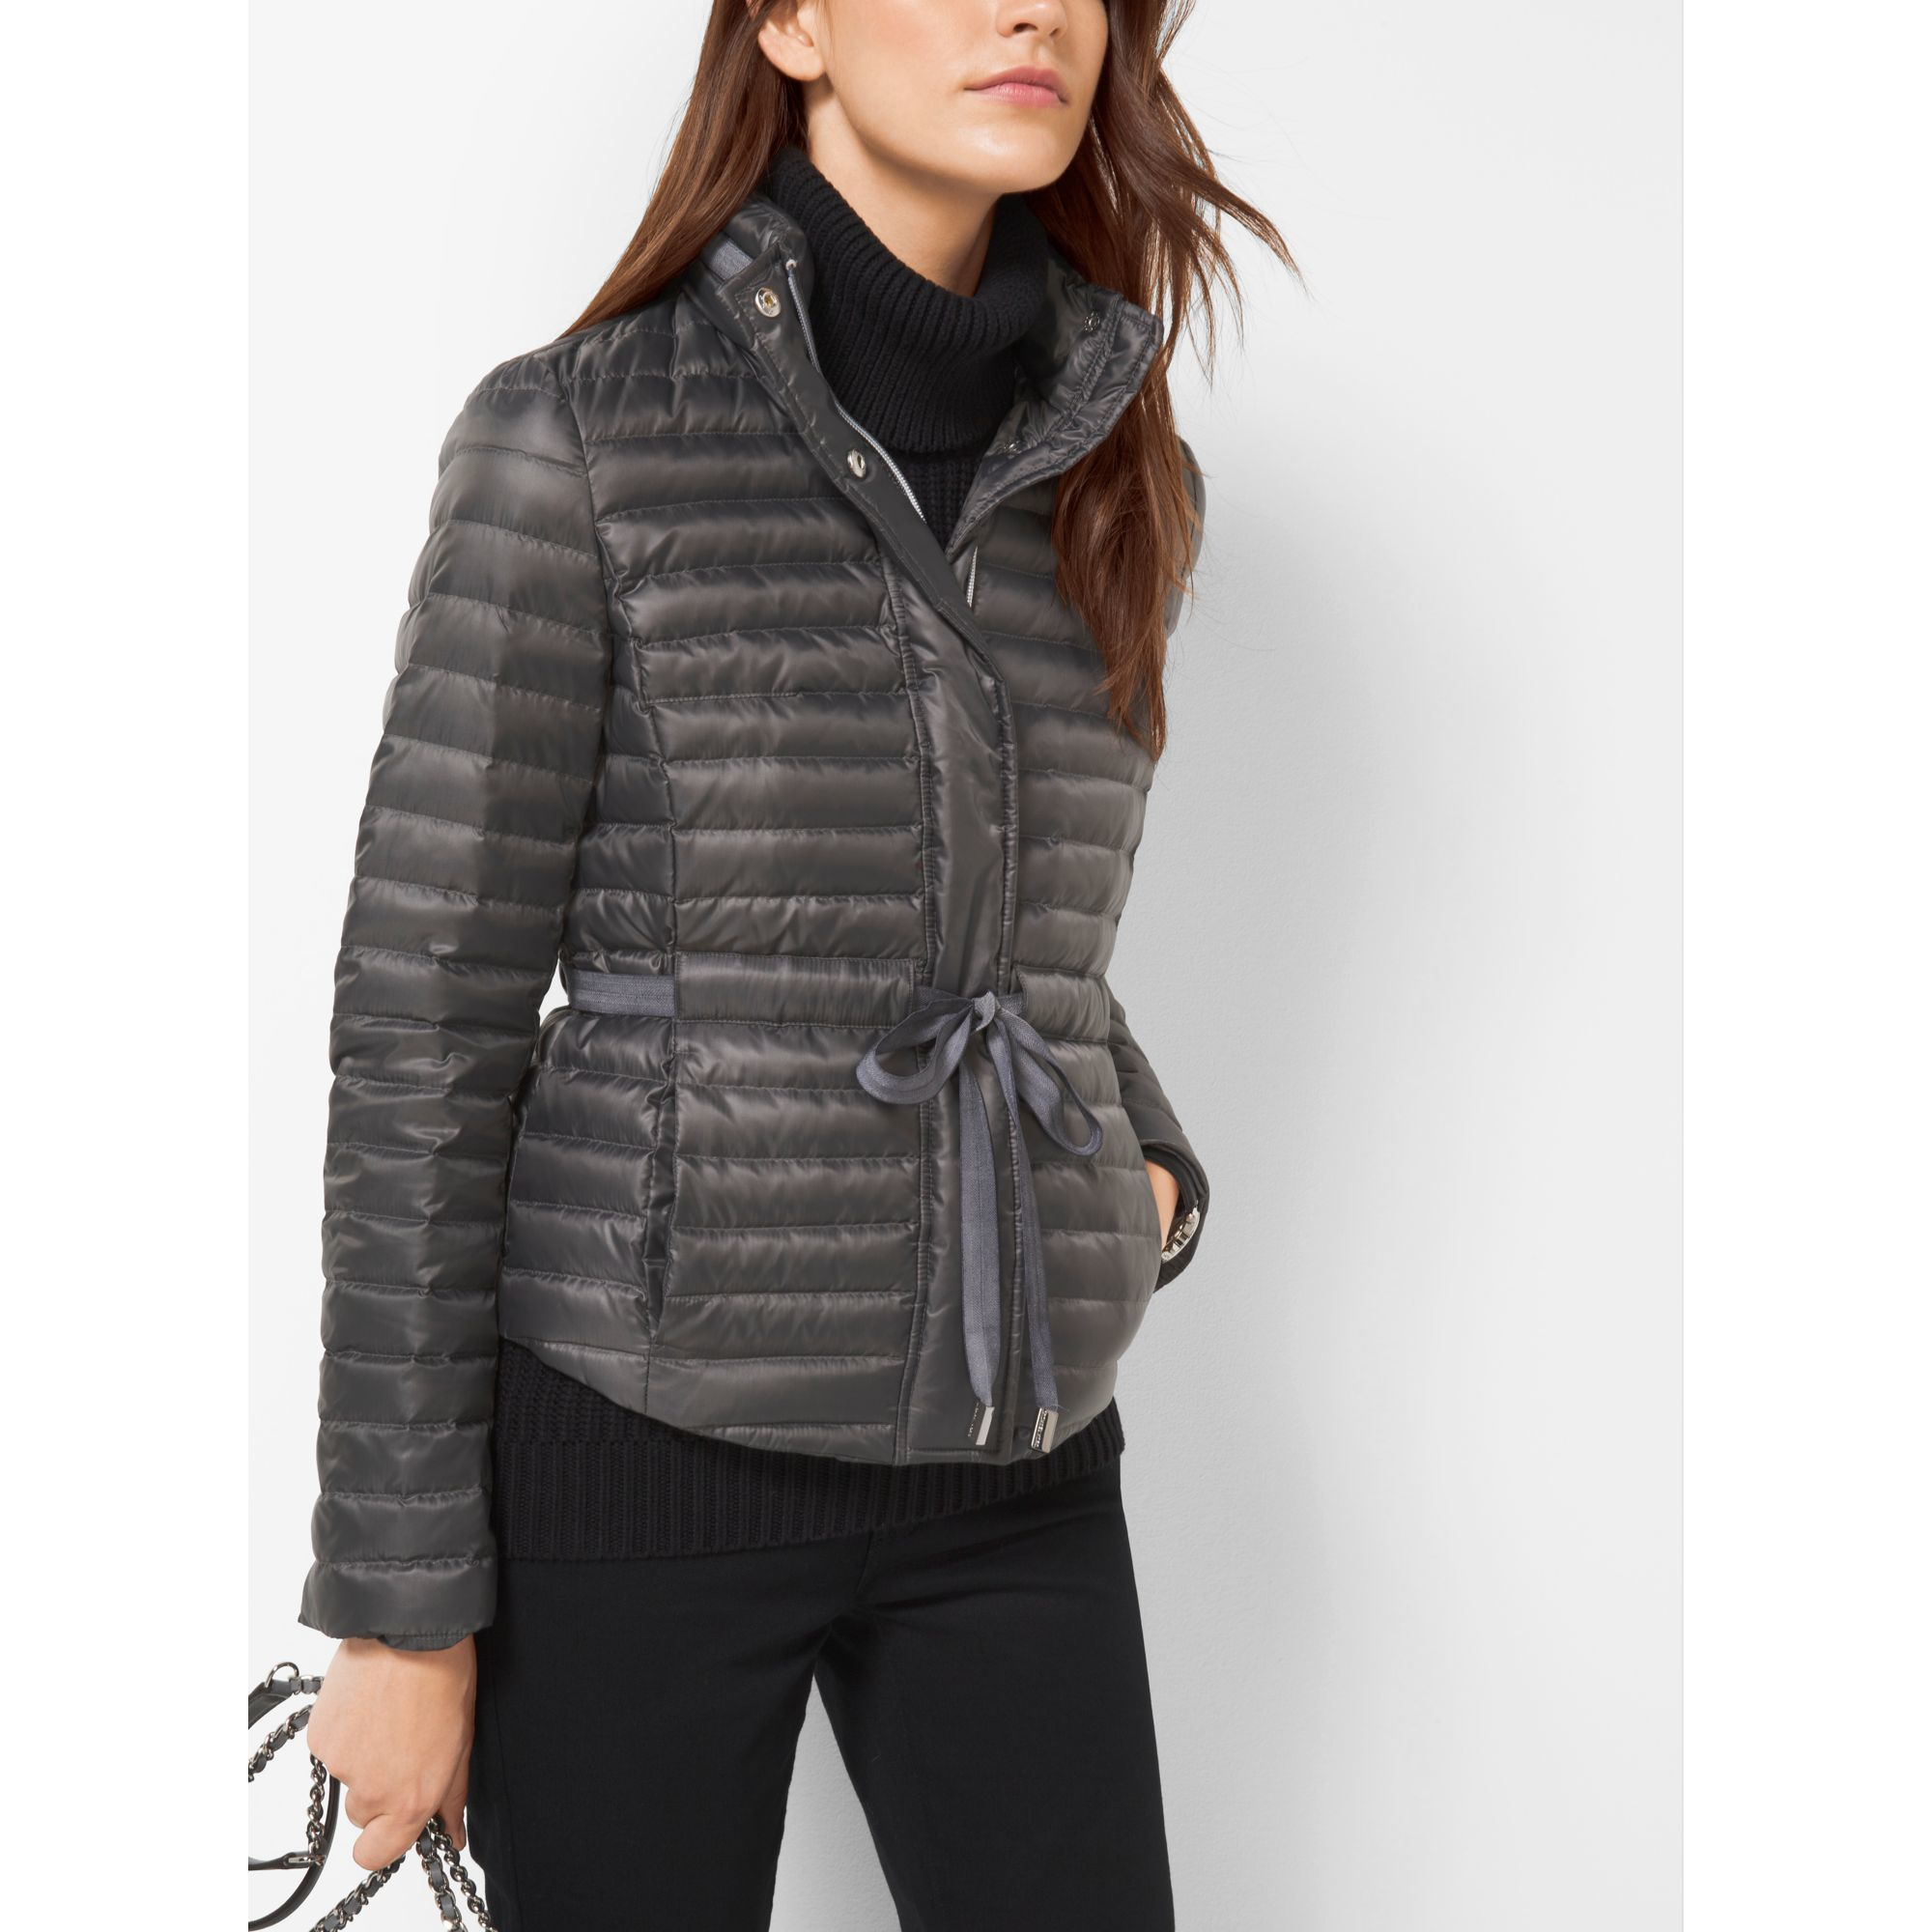 Michael Kors Packable Nylon Puffer Jacket Lyst